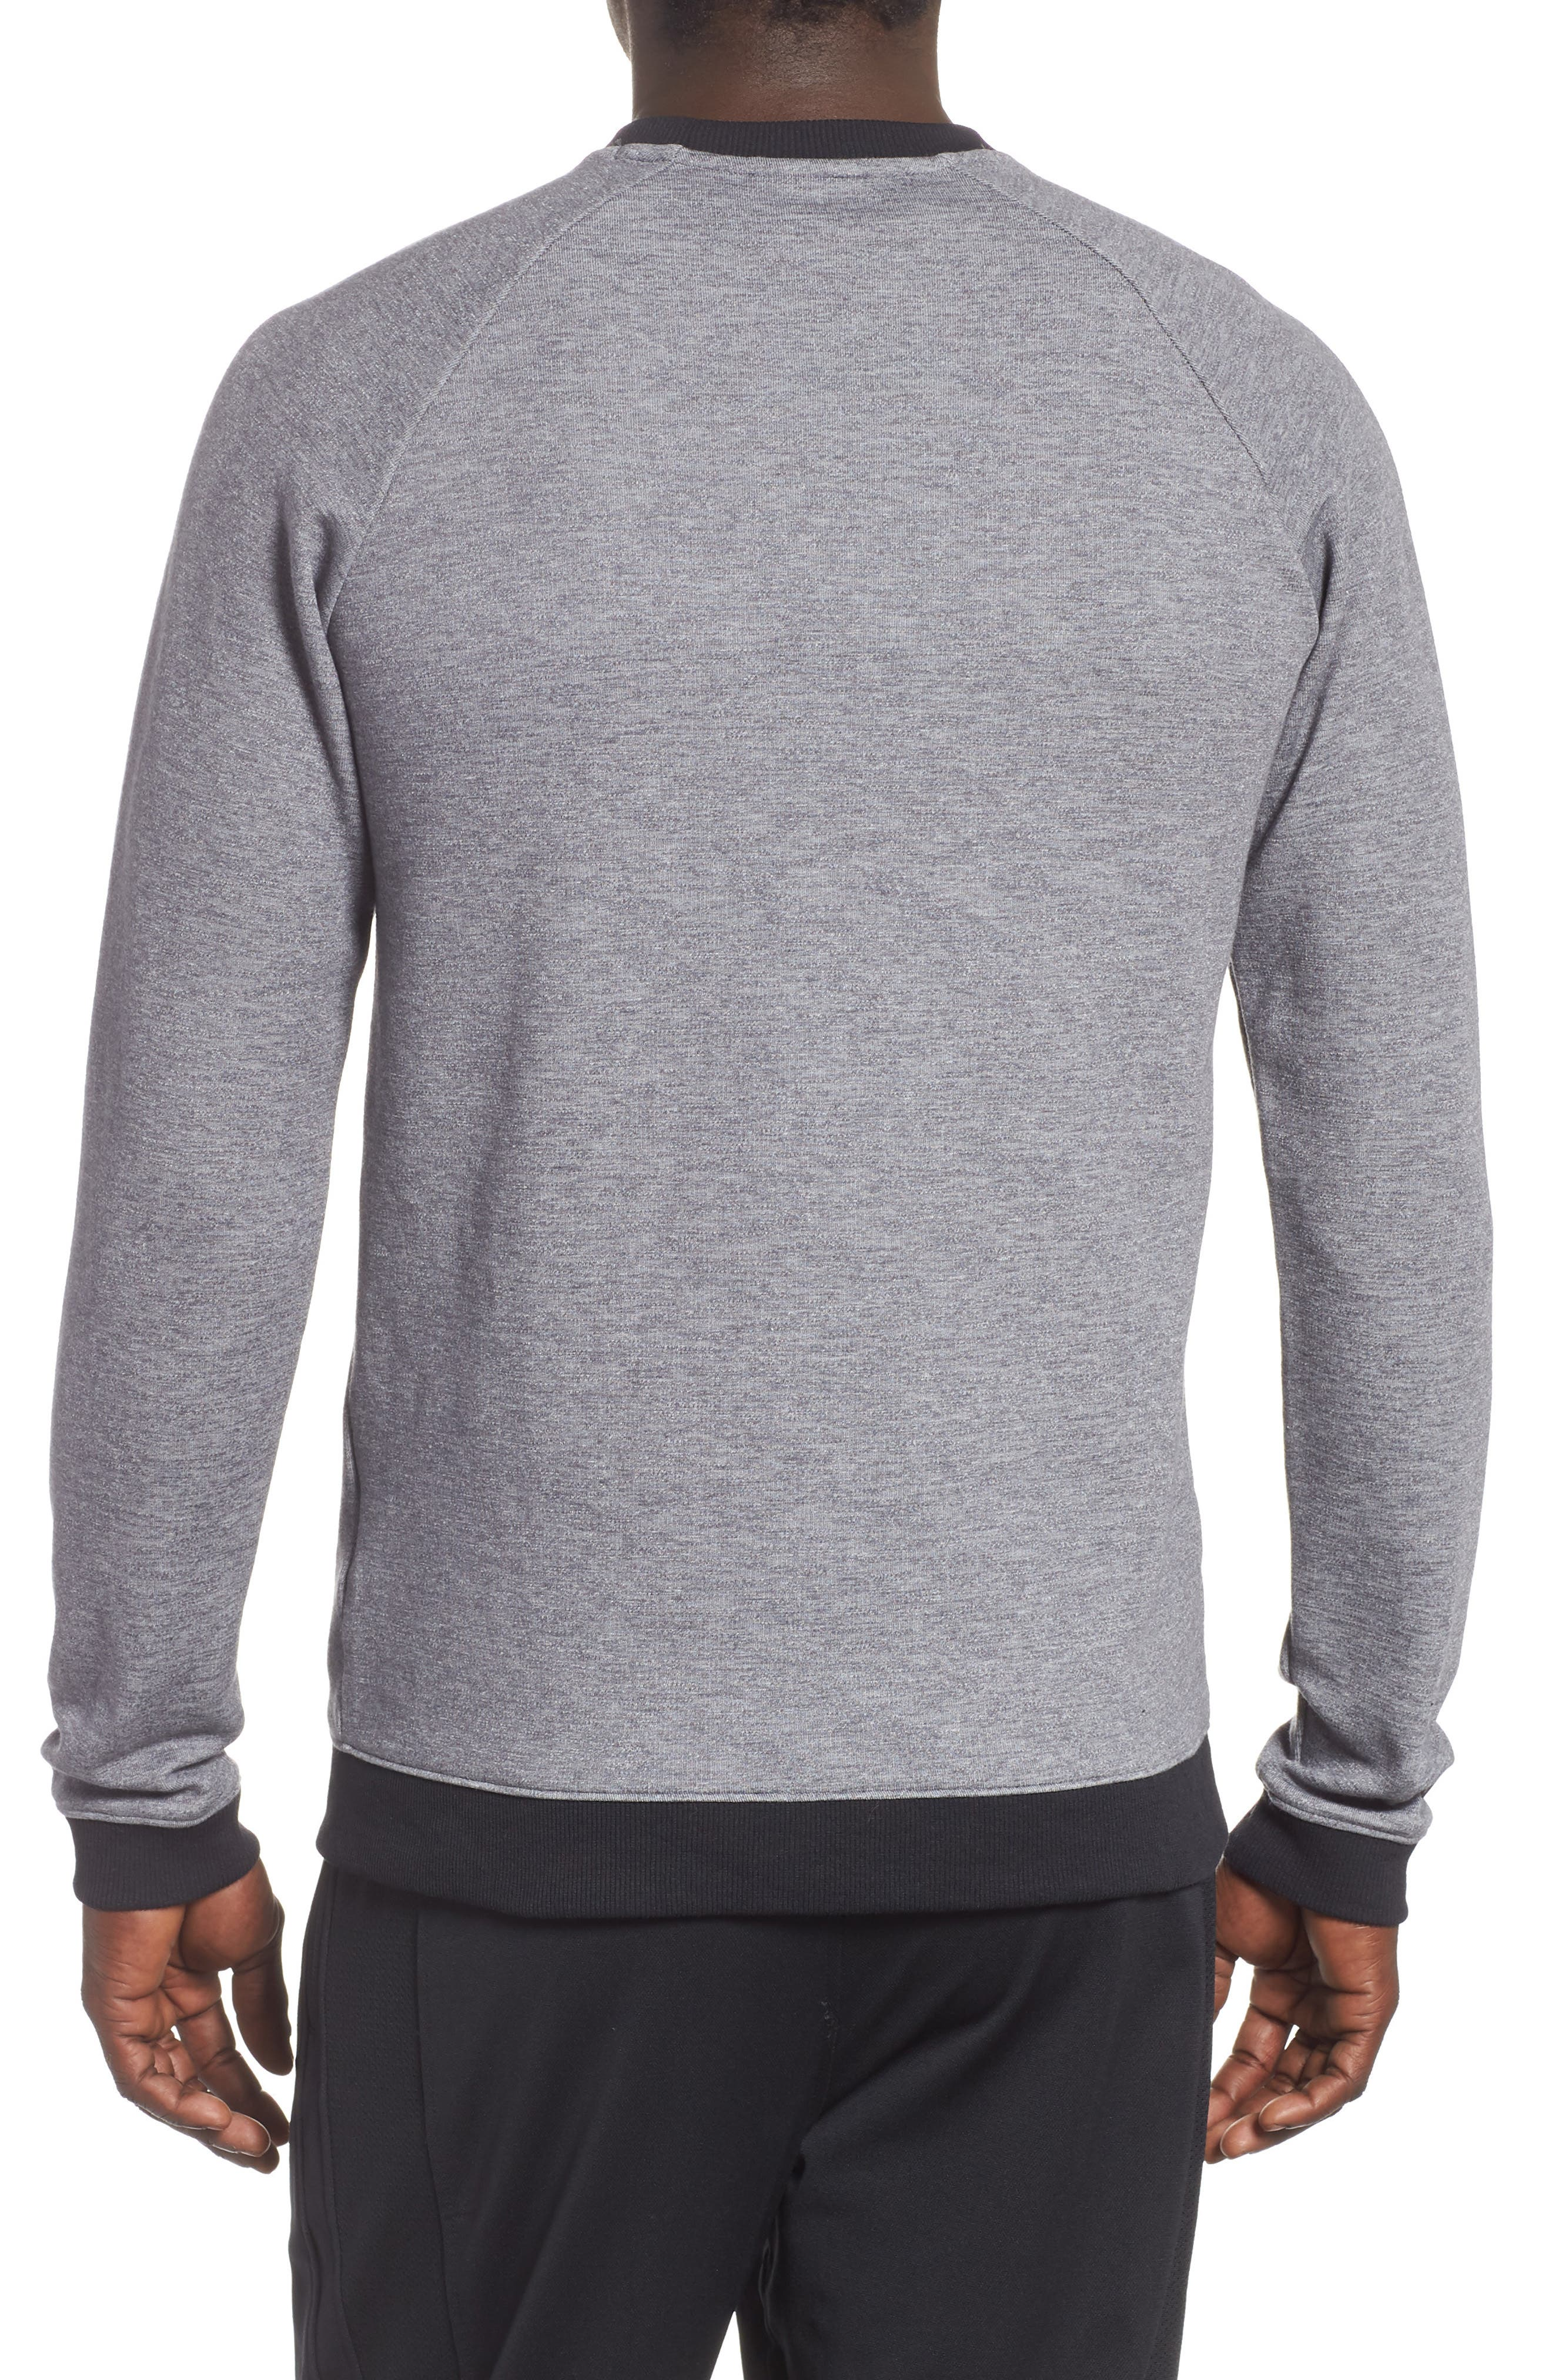 UNDER ARMOUR,                             Sportstyle 2x Crew Sweatshirt,                             Alternate thumbnail 2, color,                             STEEL